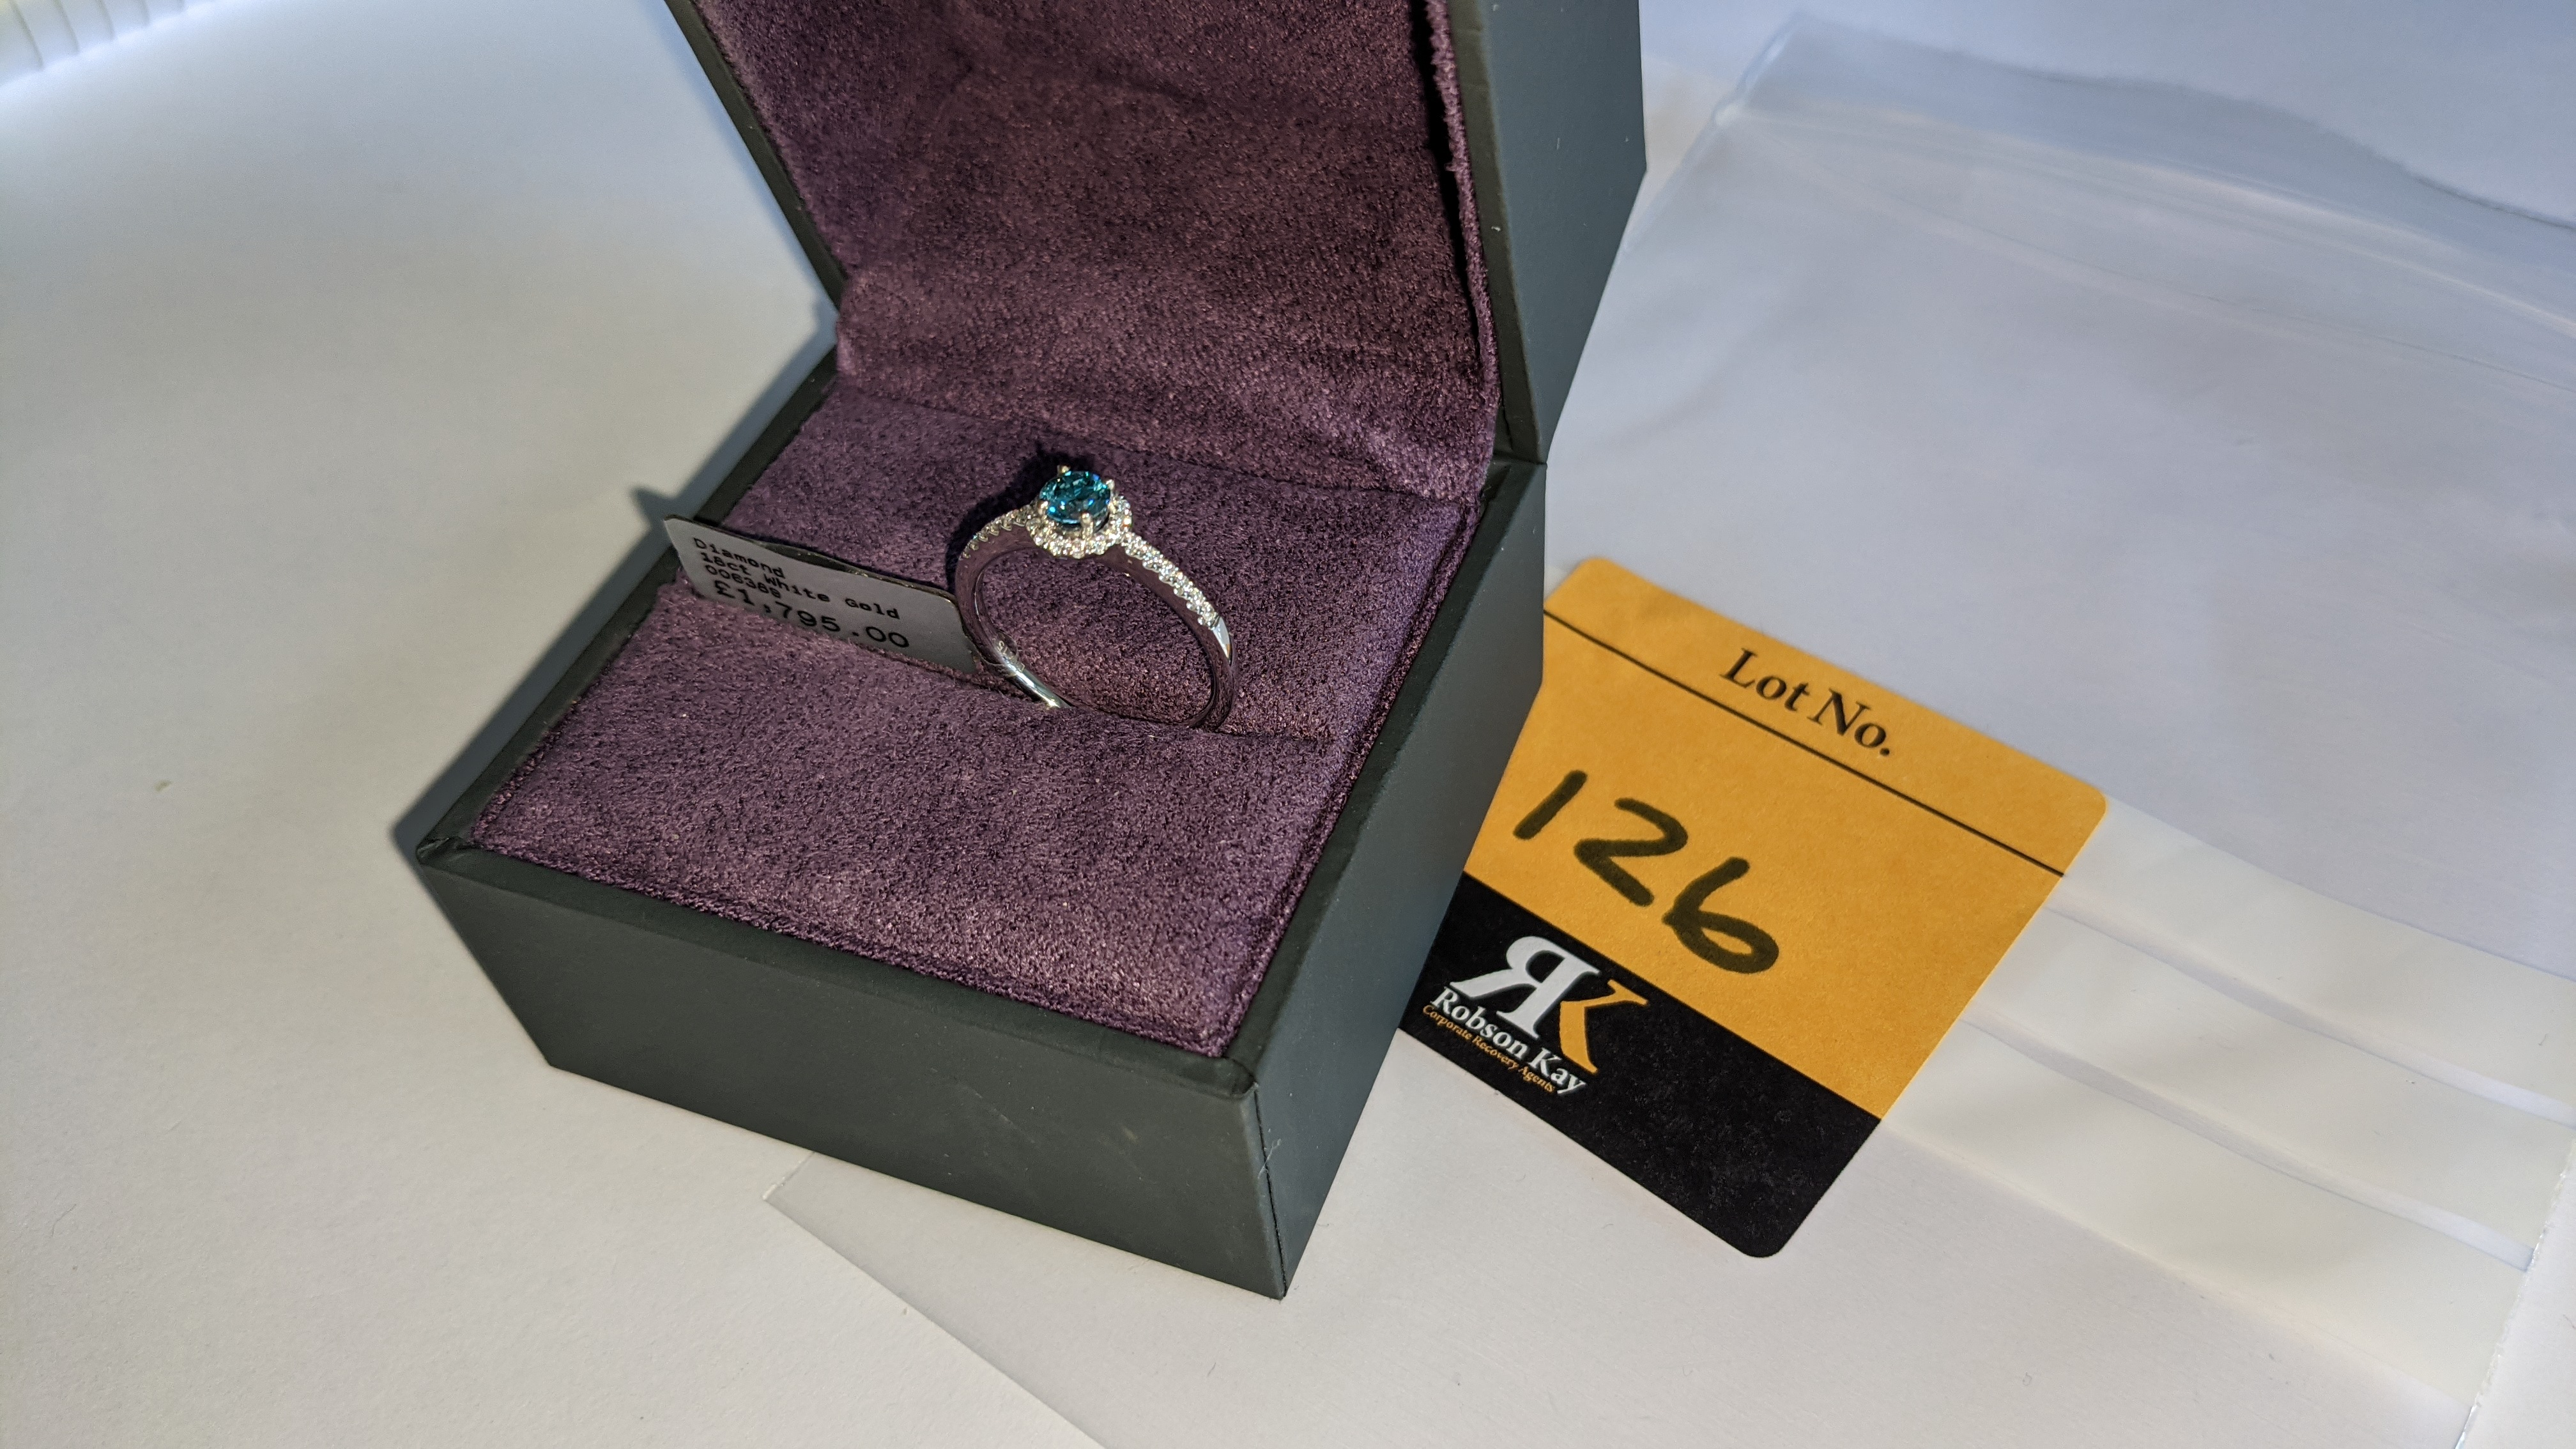 18ct white gold & diamond ring with 0.30ct blue diamond & 0.1ct of additional diamonds around the ce - Image 6 of 19